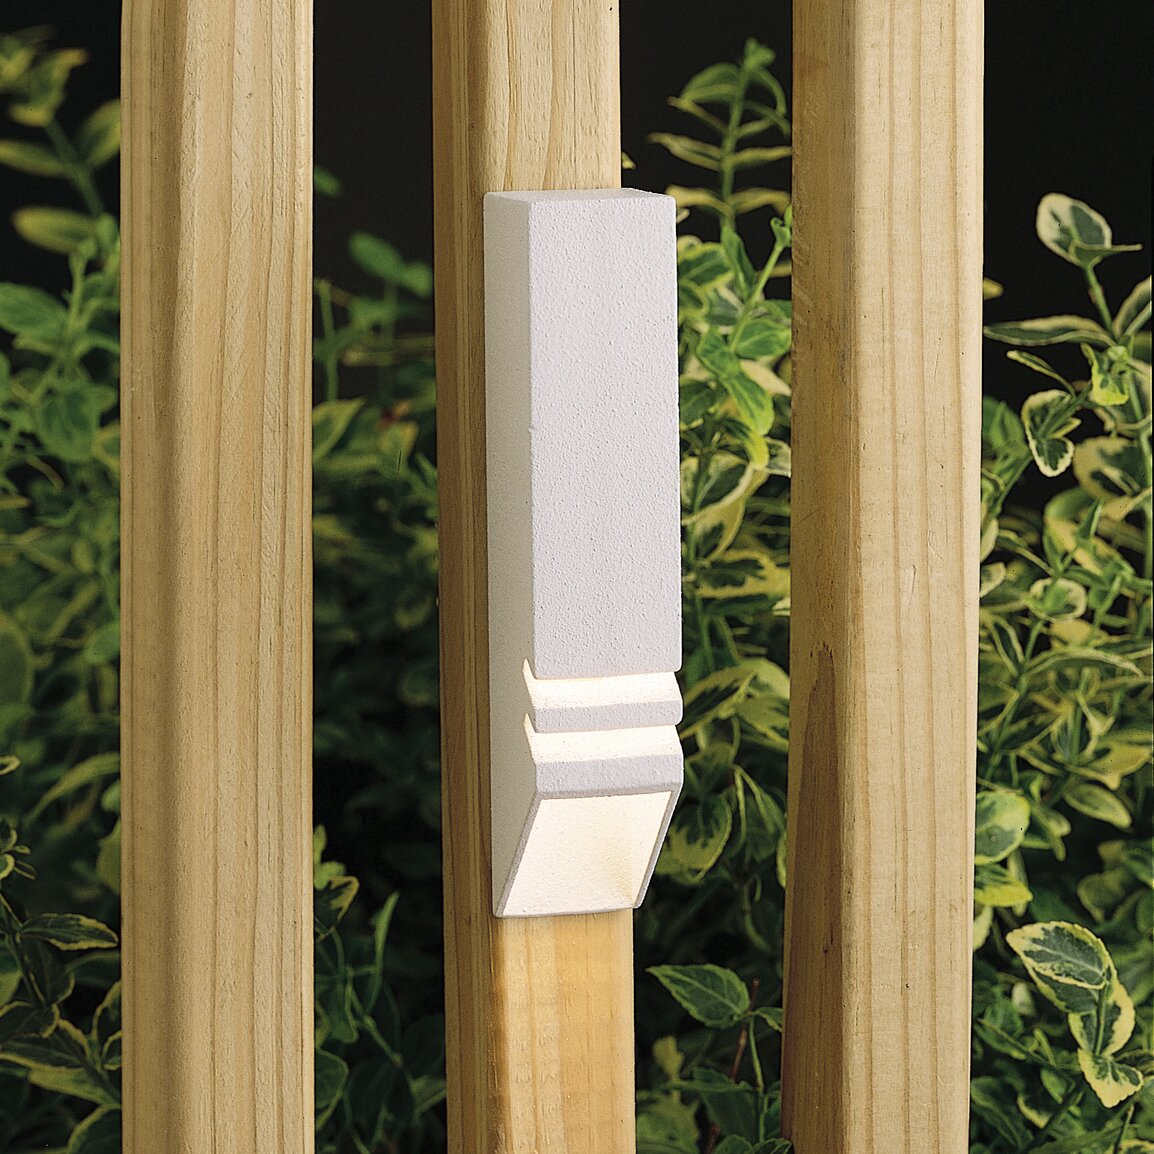 Kichler Landscape Lighting Reviews : Kichler deck lighting reviews wayfair